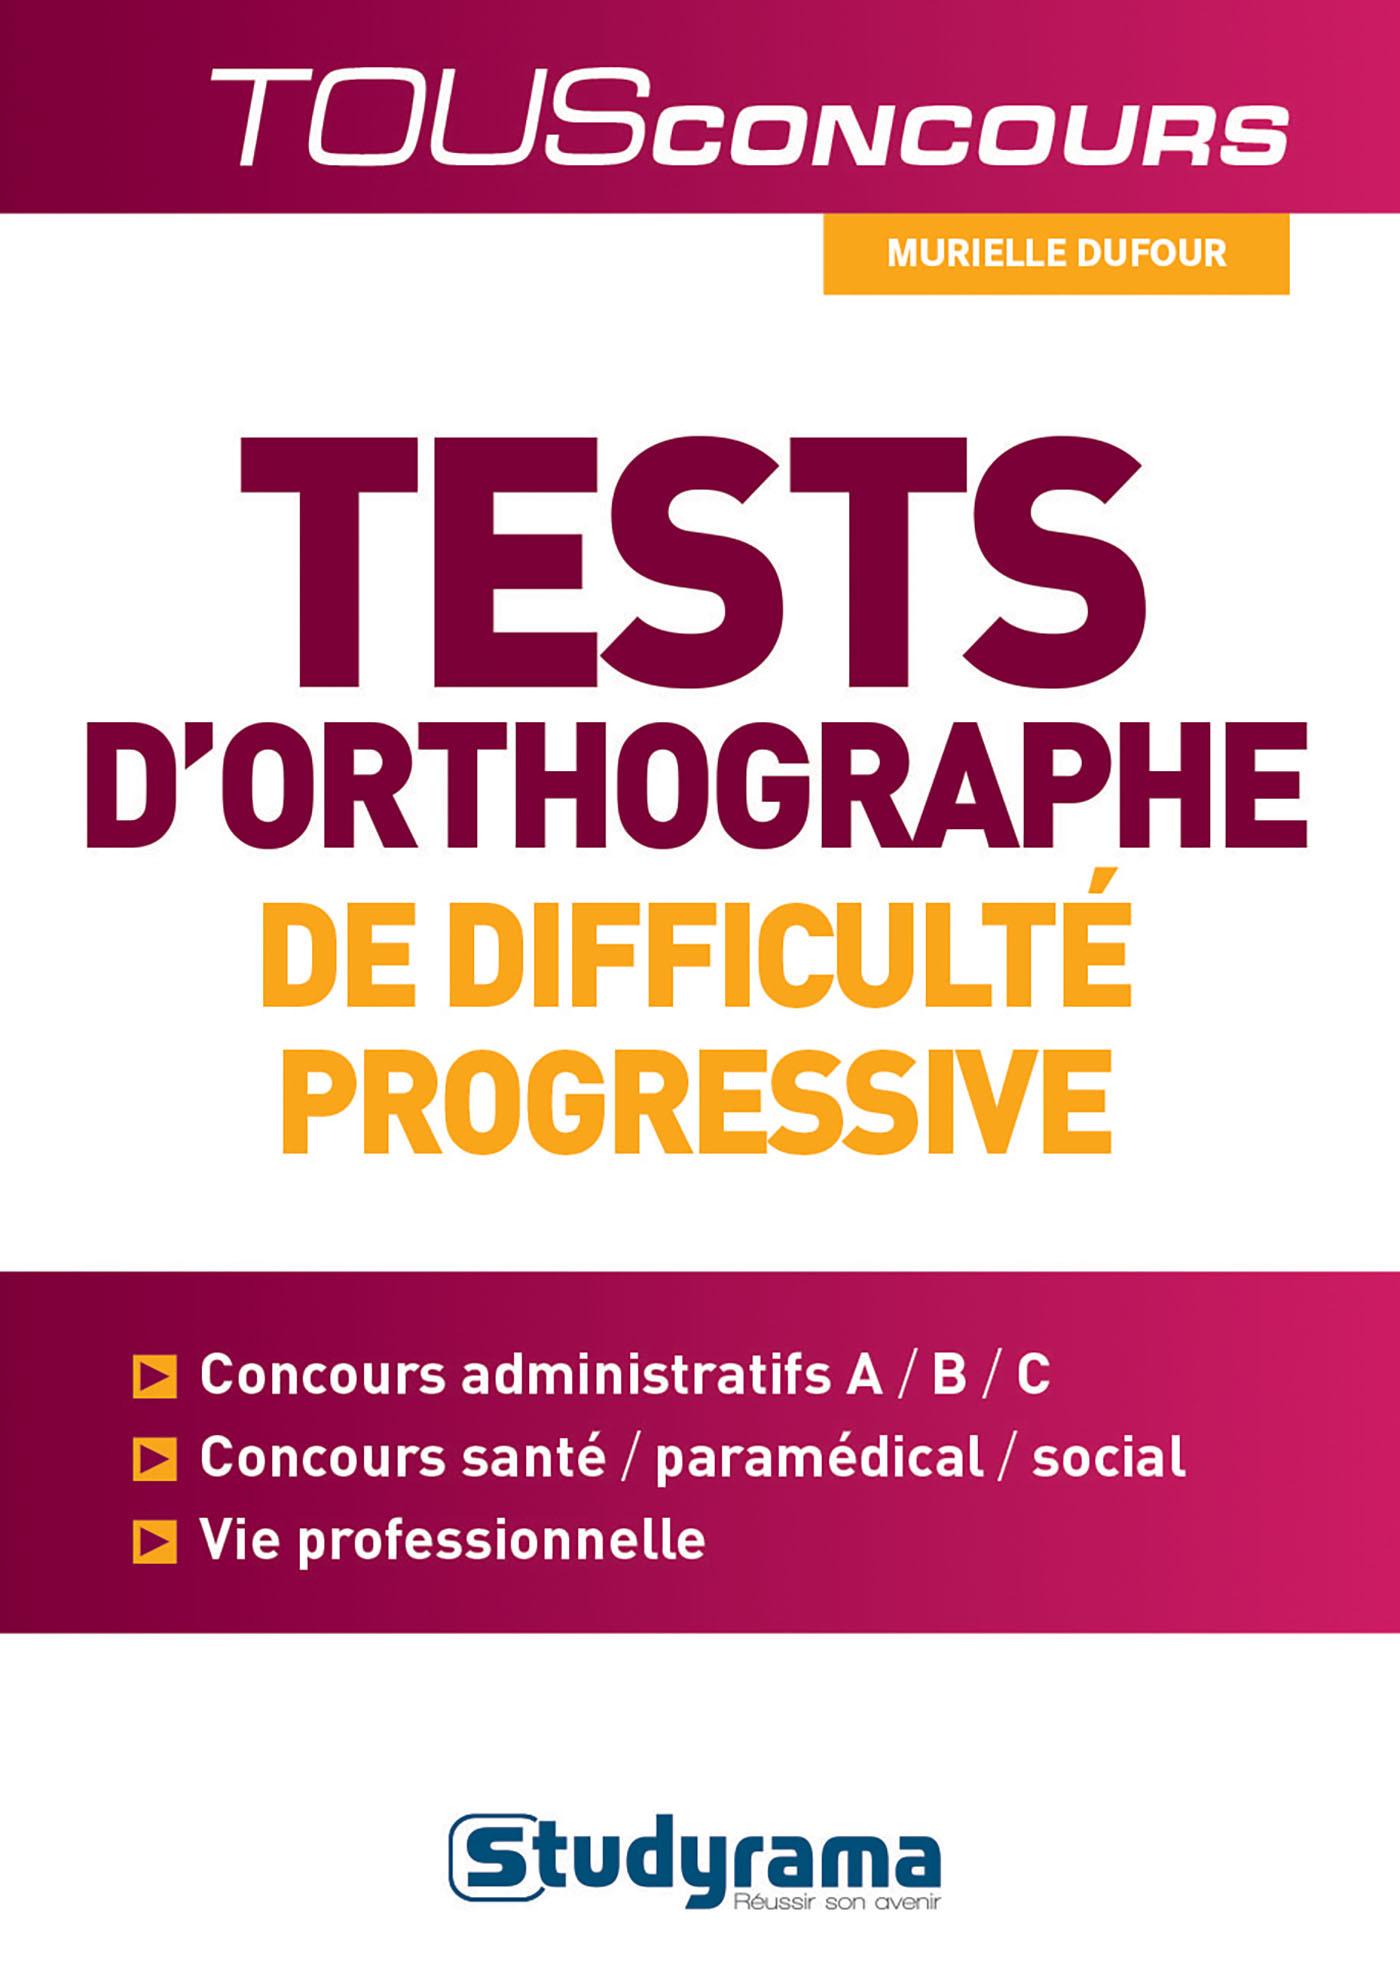 TESTS D'ORTHOGRAPHE DE DIFFICULTE PROGRESSIVE